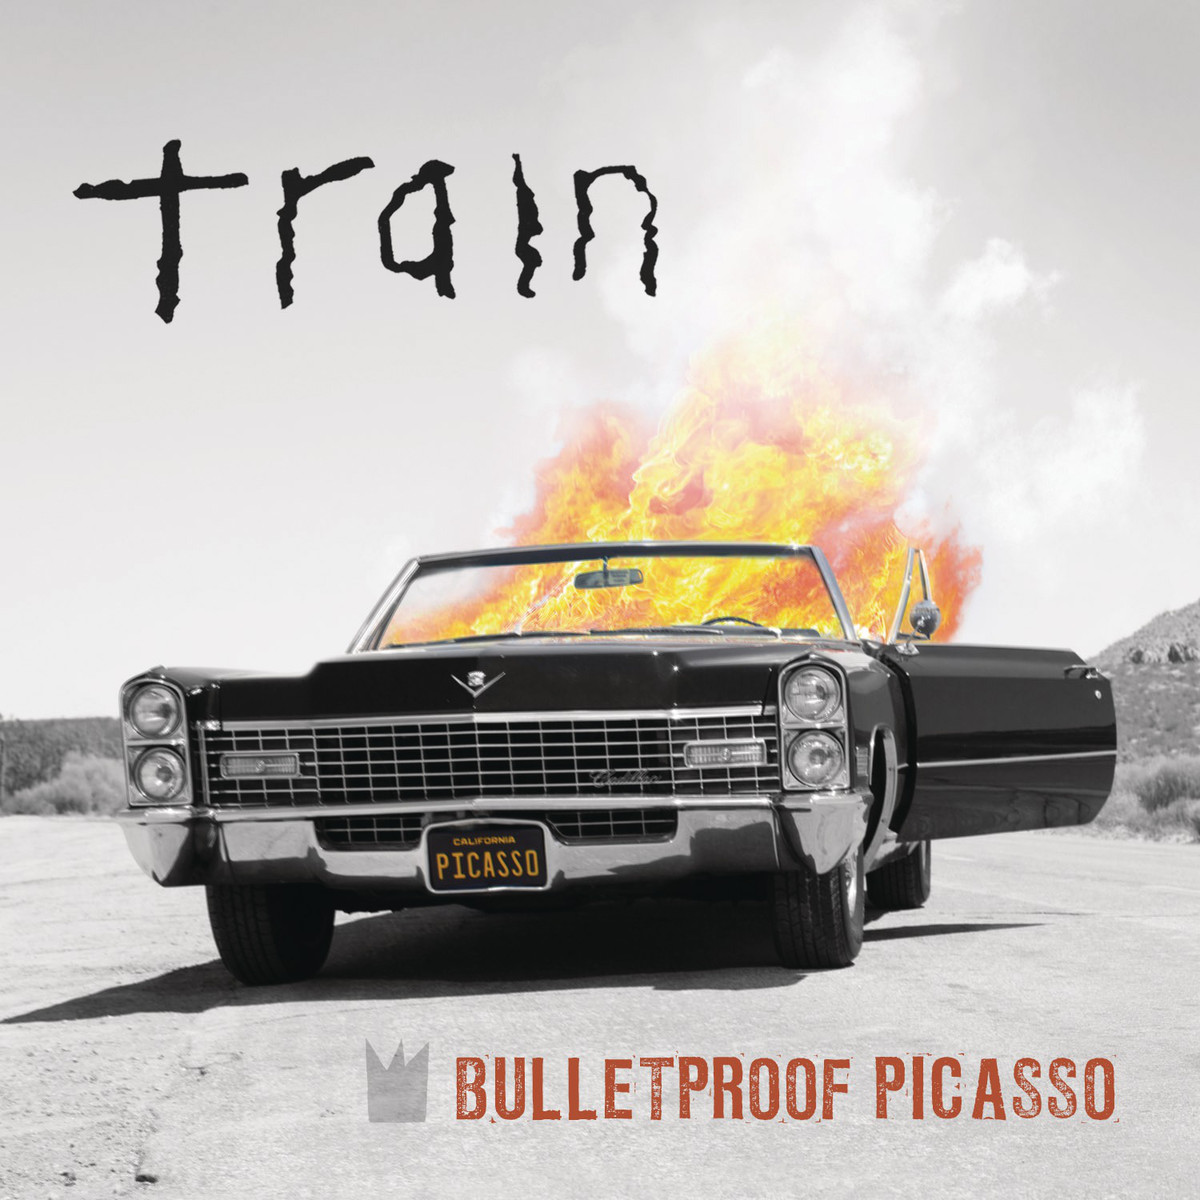 Download Train - Bulletproof Picasso 2015 MP3 Música